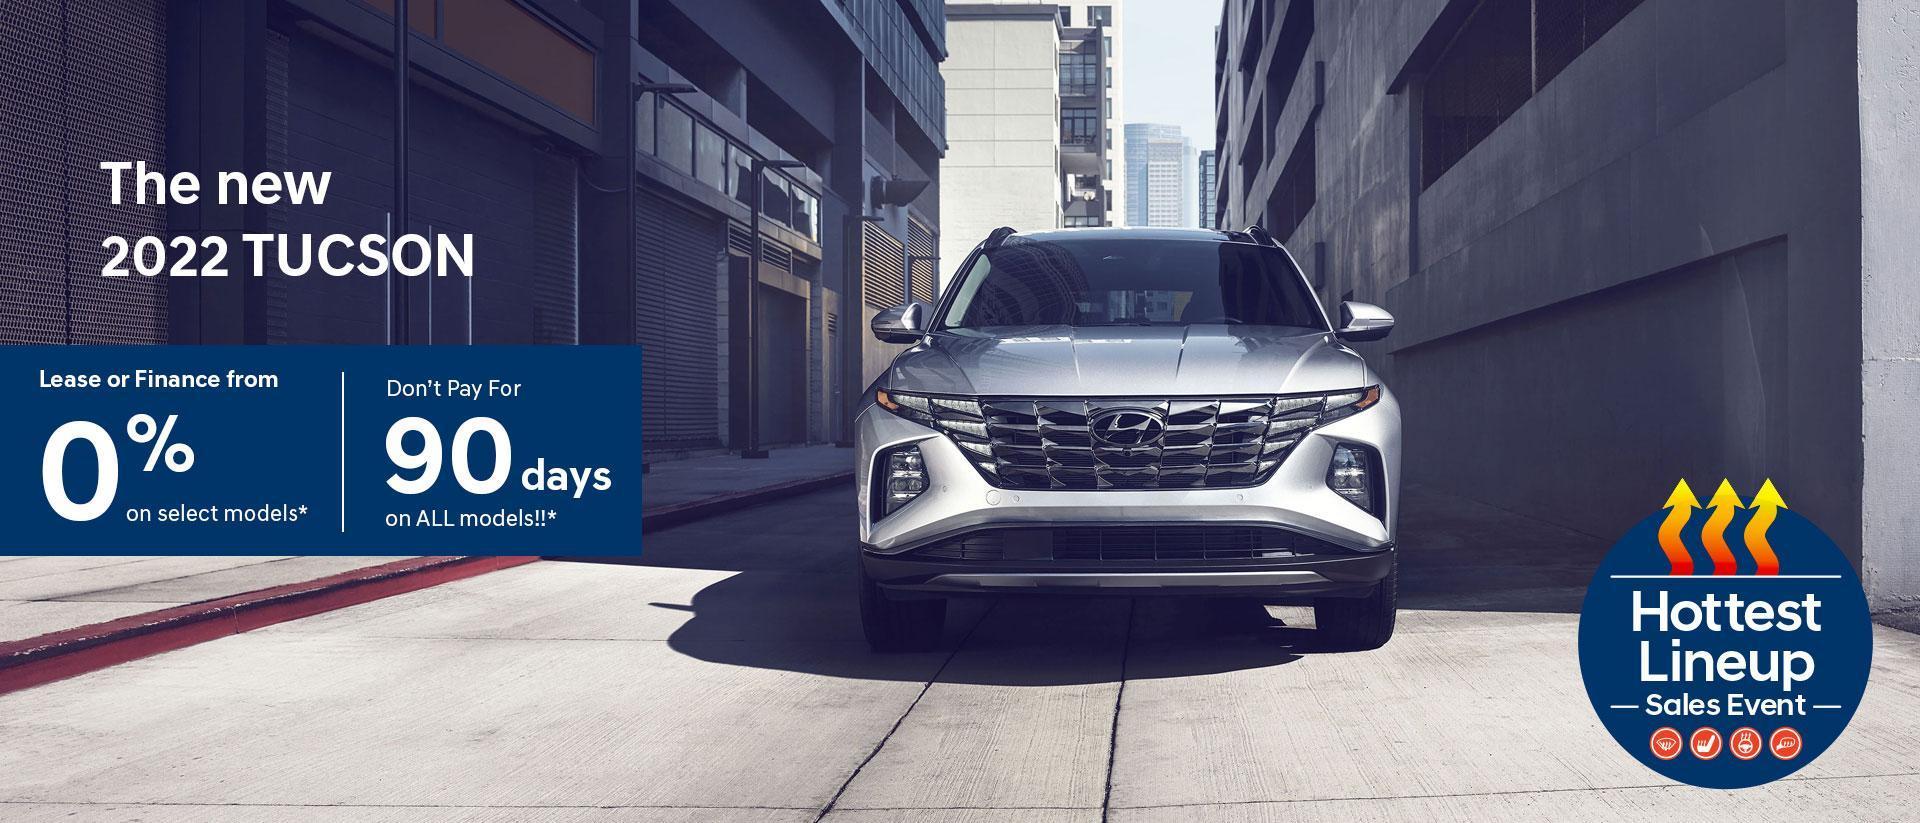 Hottest Lineup Sales Event | Hyundai of Canada | 2022 Hyundai Tucson | Central Nova Hyundai